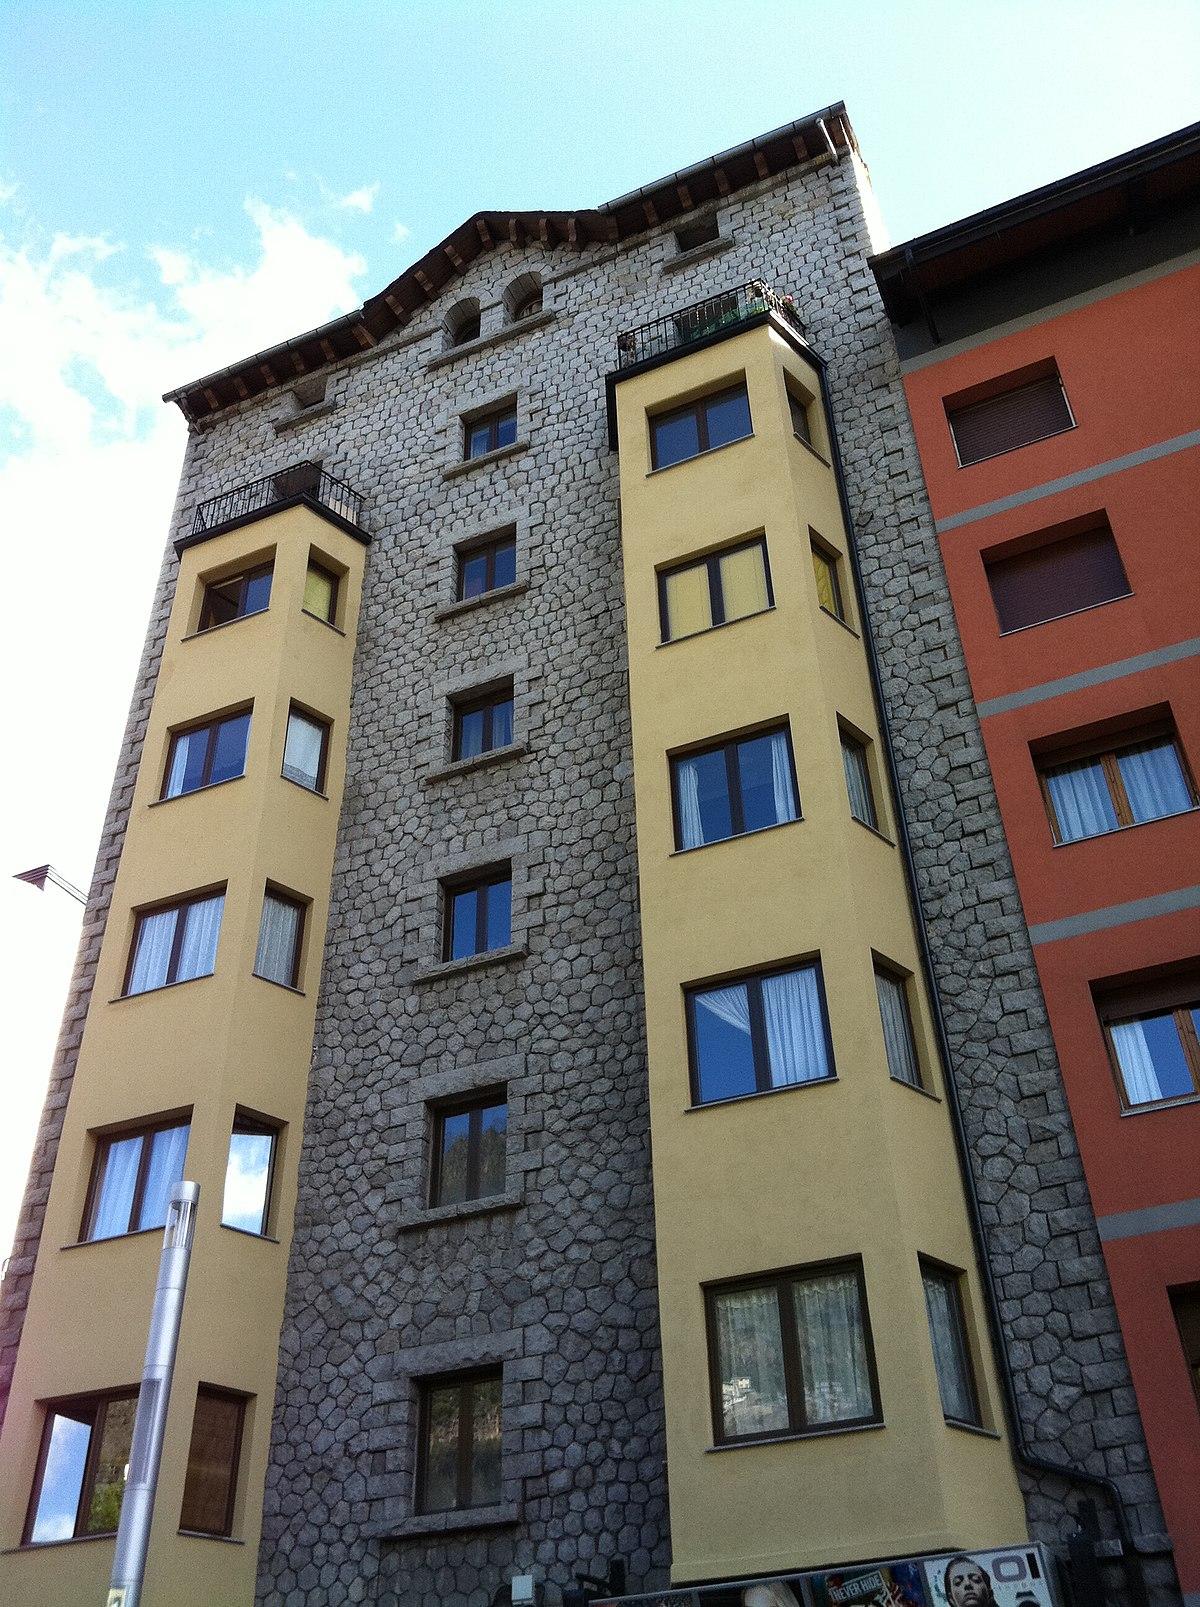 Casa Palmitjavila  Wikipedia